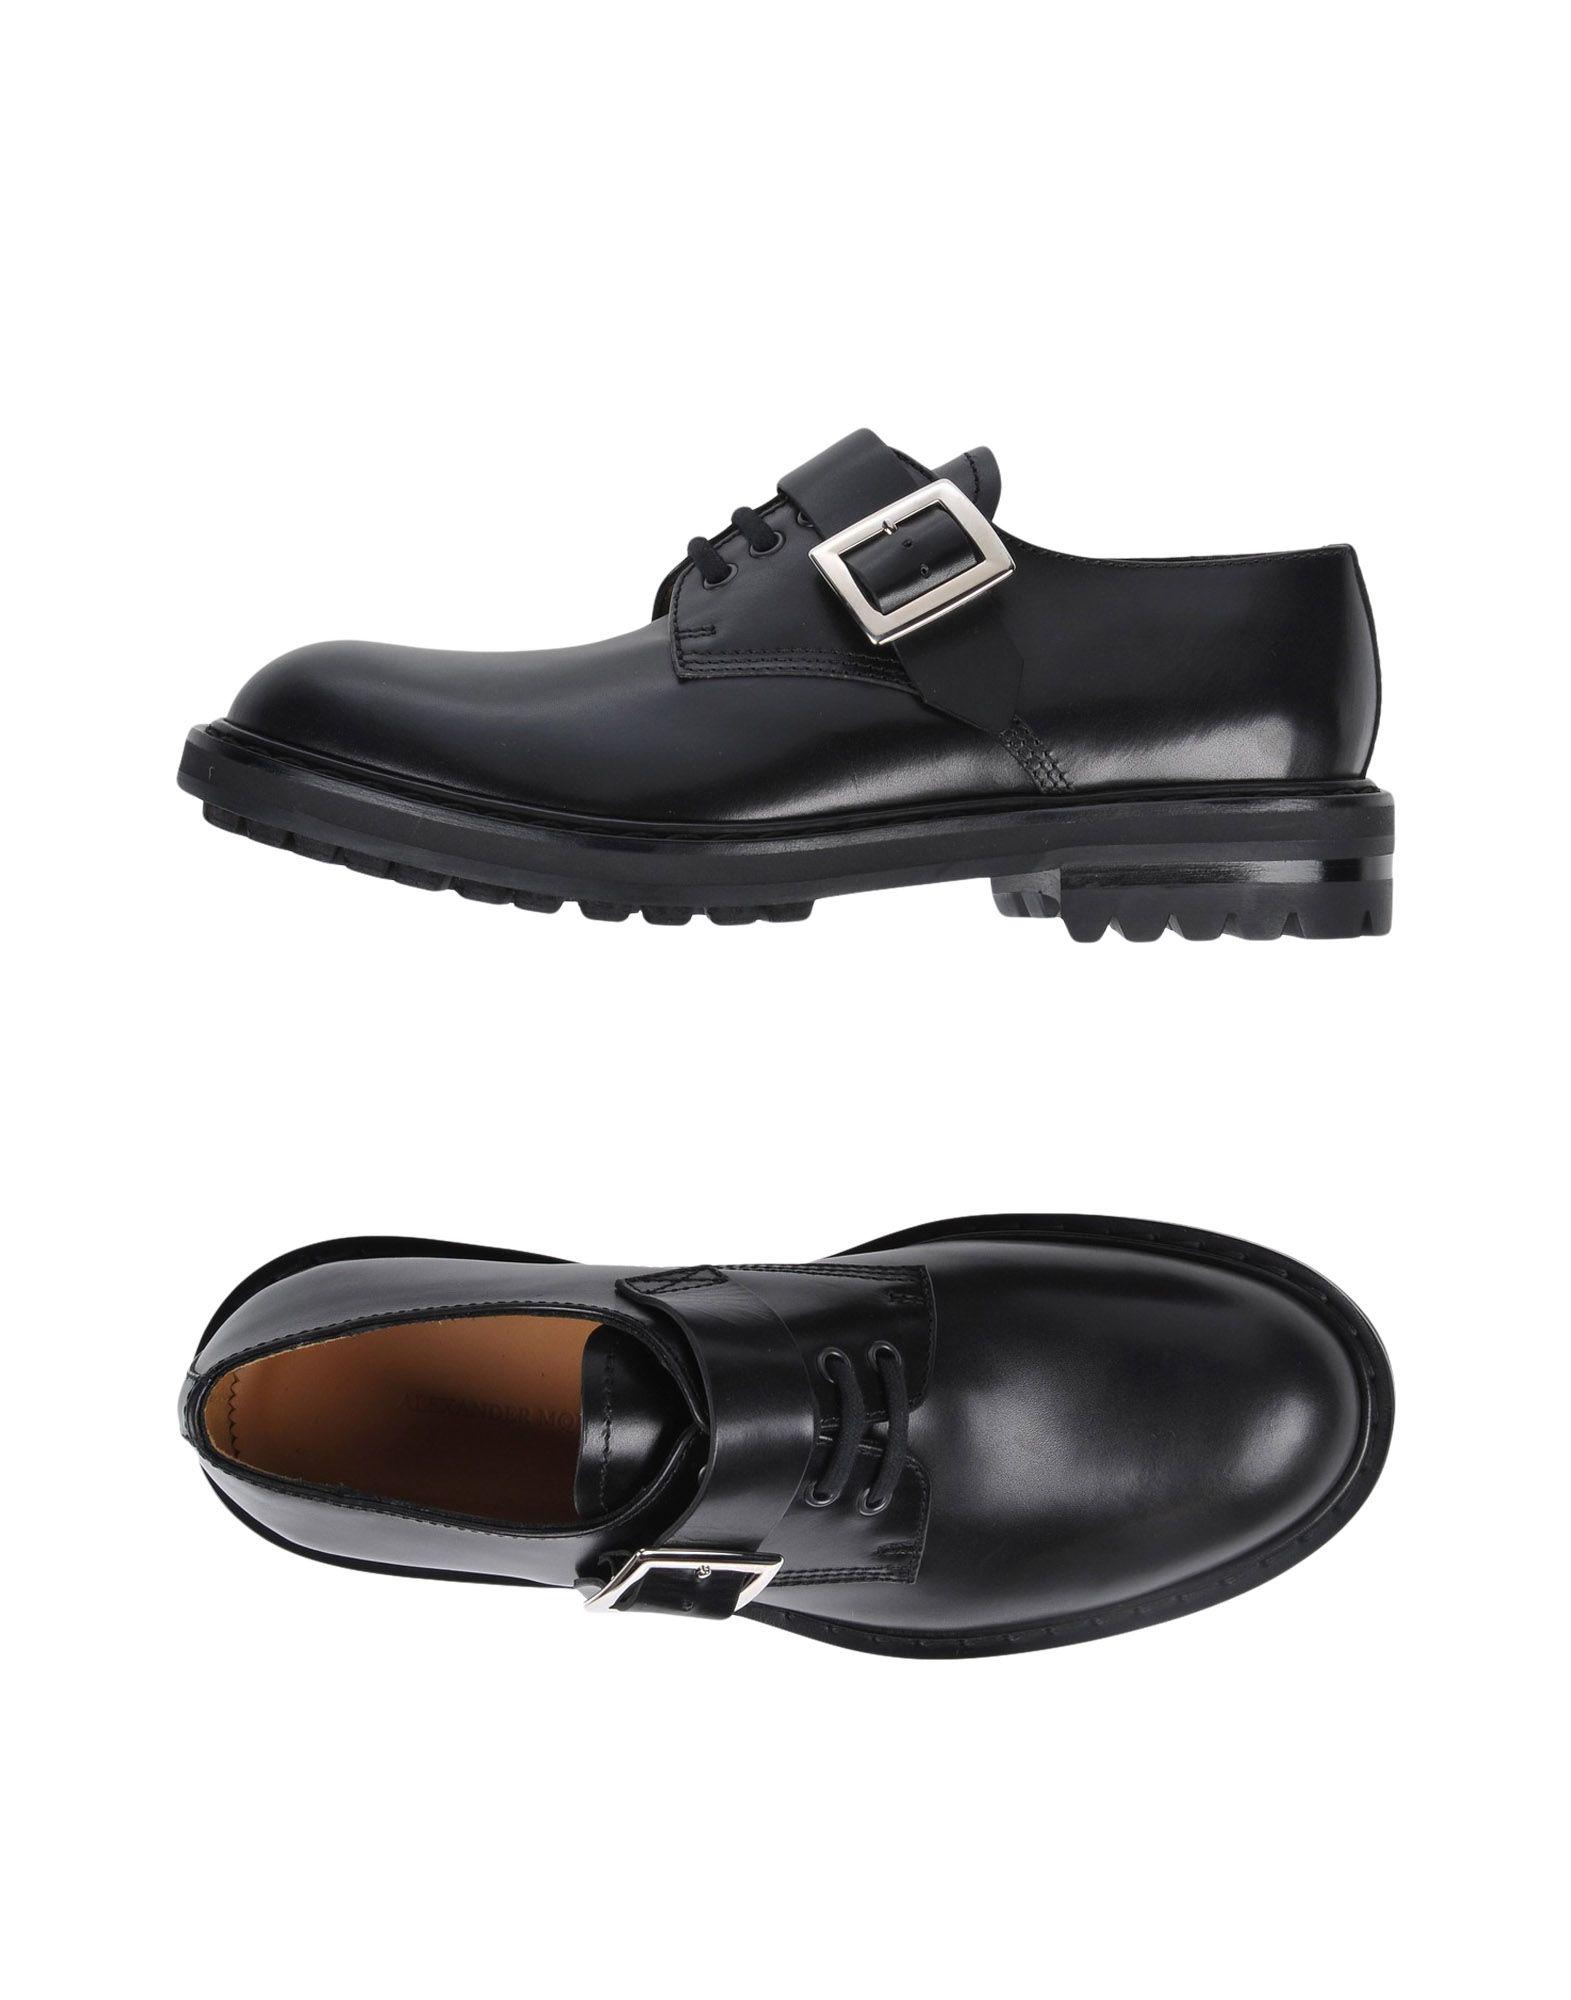 Alexander Mcqueen Schnürschuhe Herren  11485856XS Gute Qualität beliebte Schuhe